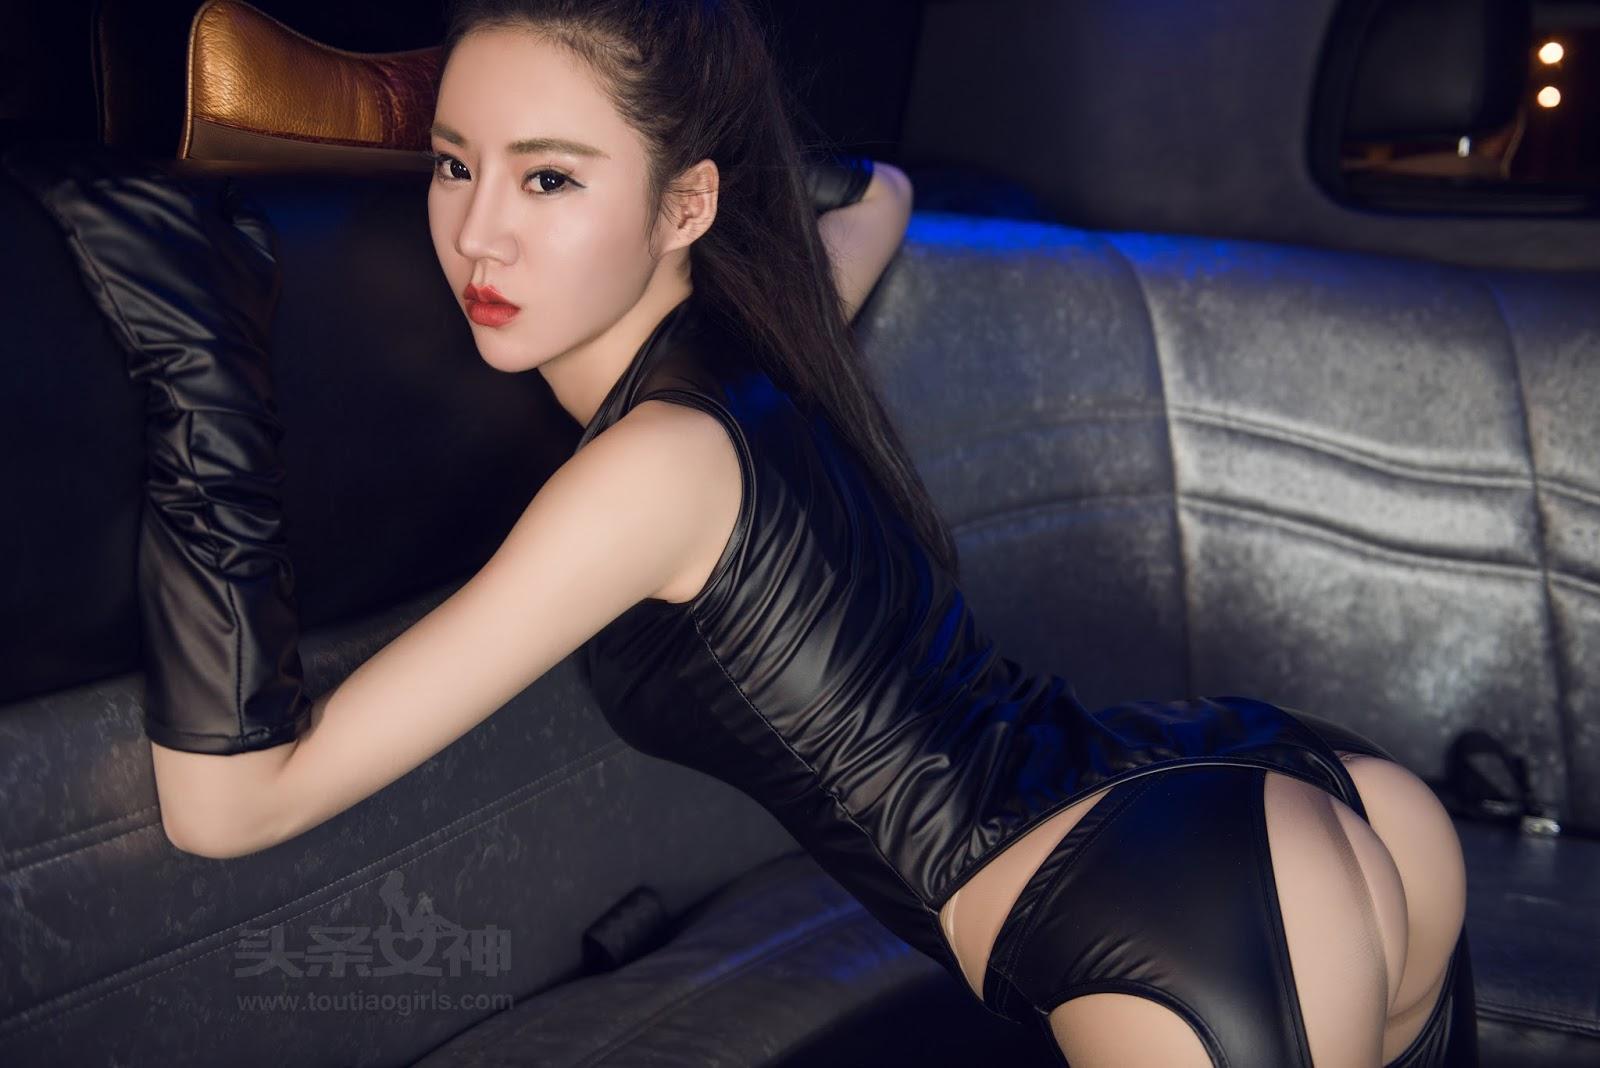 Prime Asian Escorts Has Sexy Asian, Oriental Escorts London